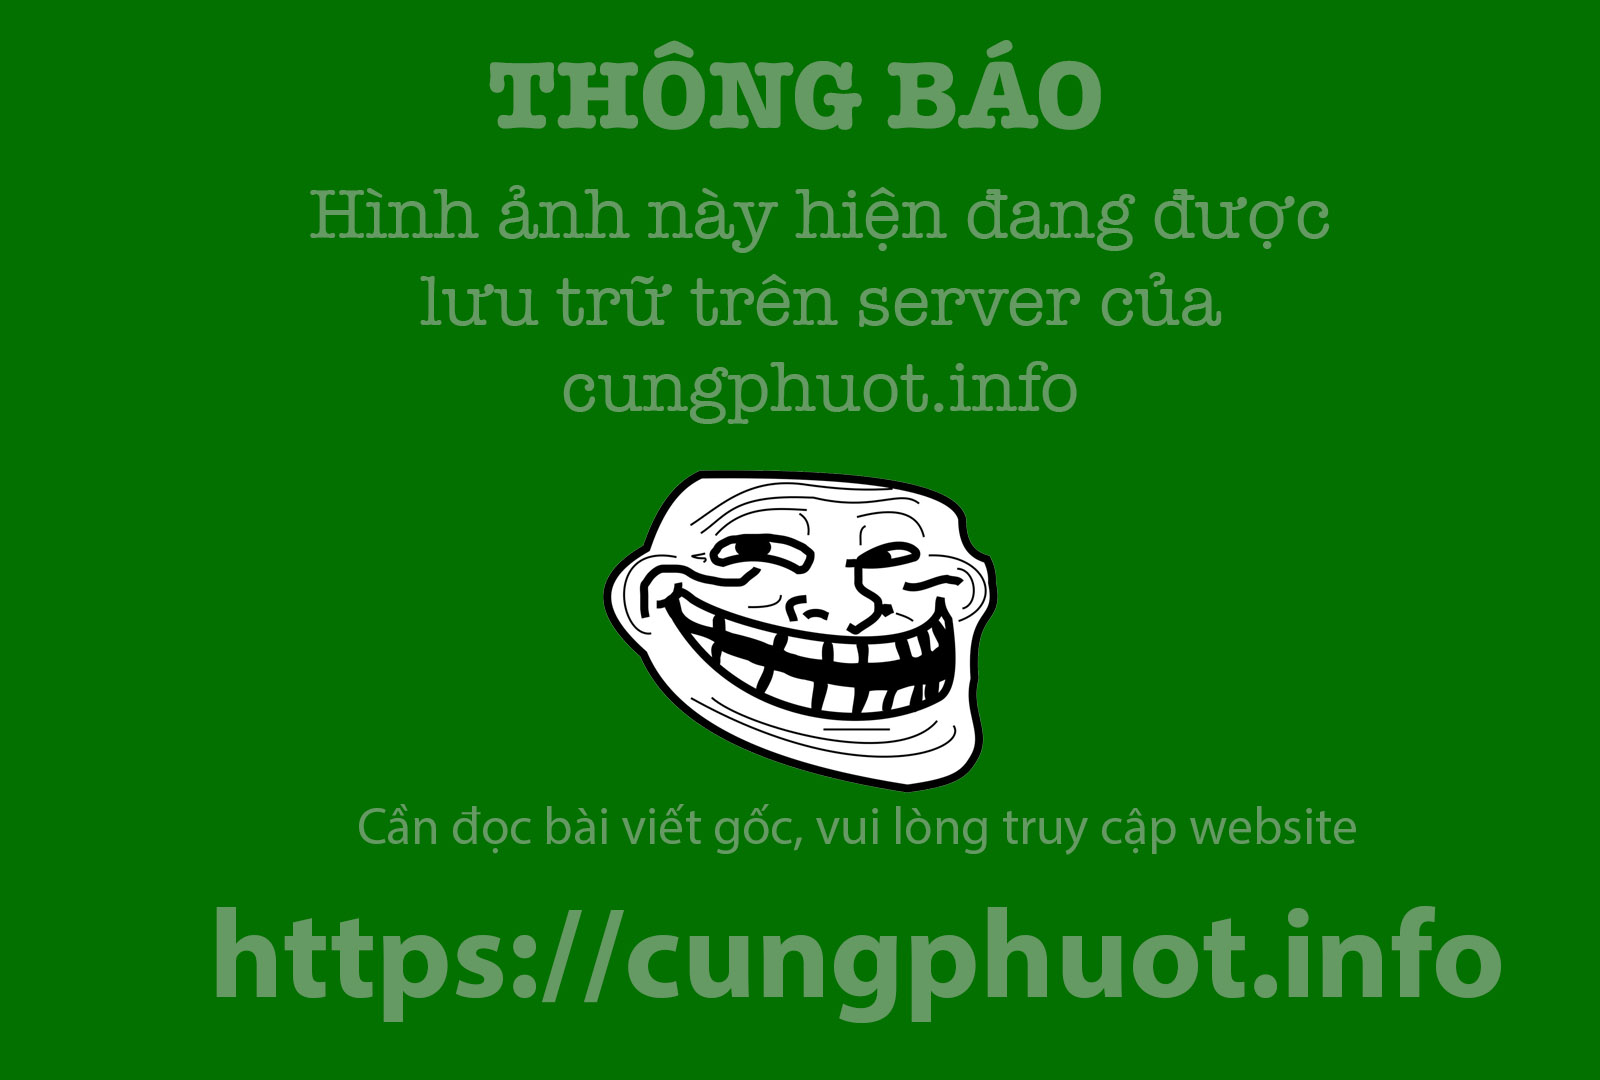 Co do Hue dep la trong suong mu hinh anh 18